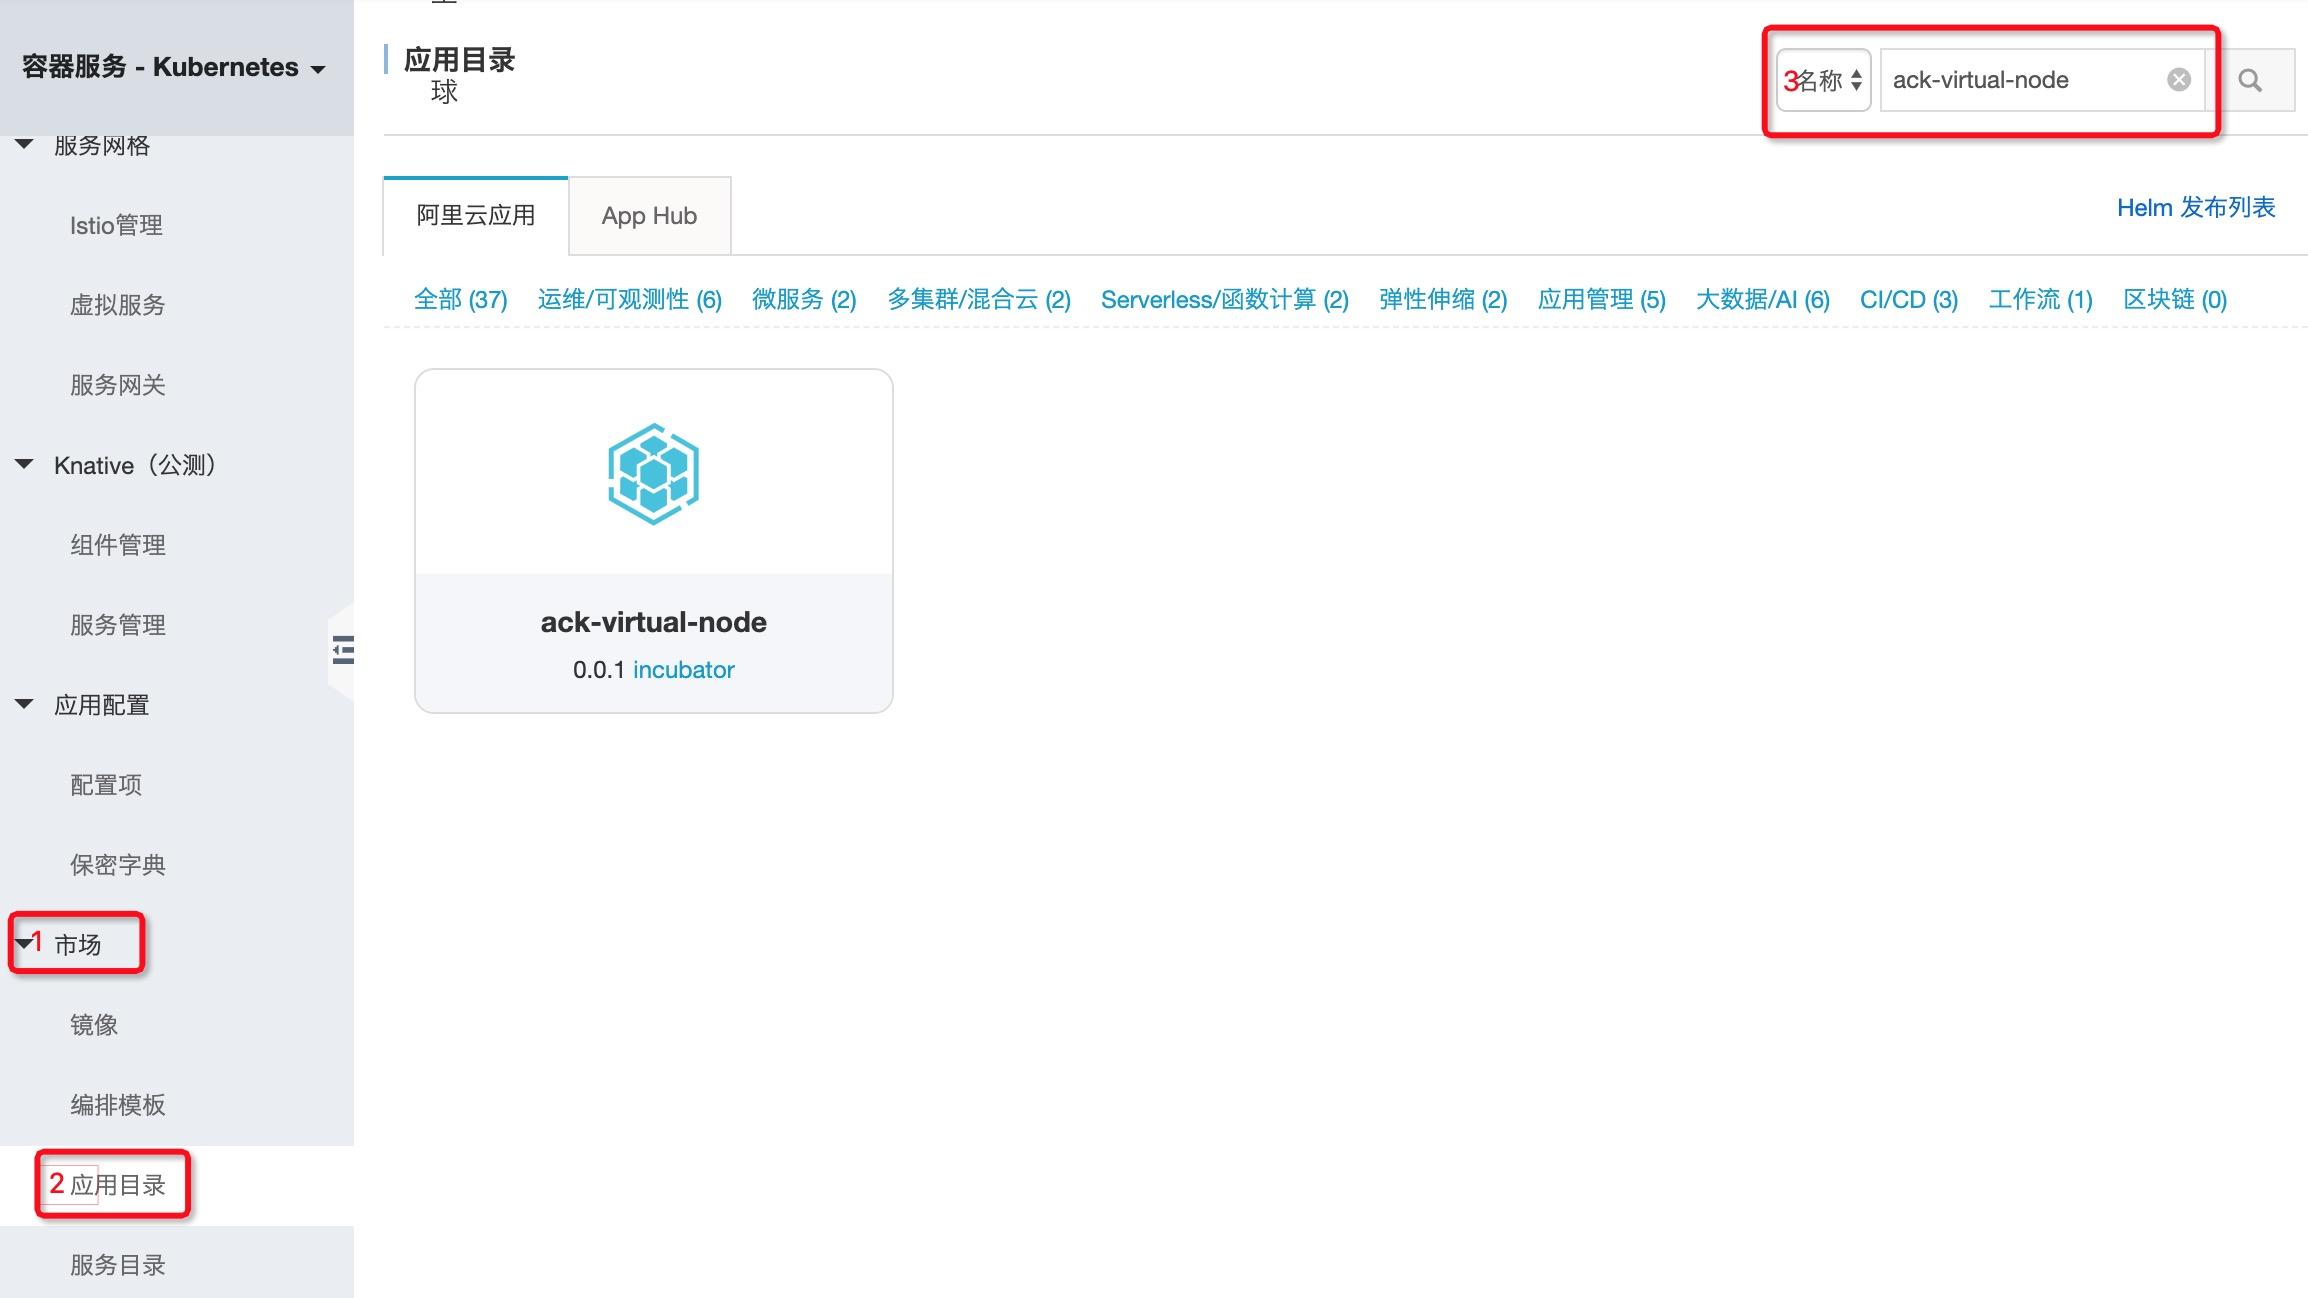 ack_virtual_node